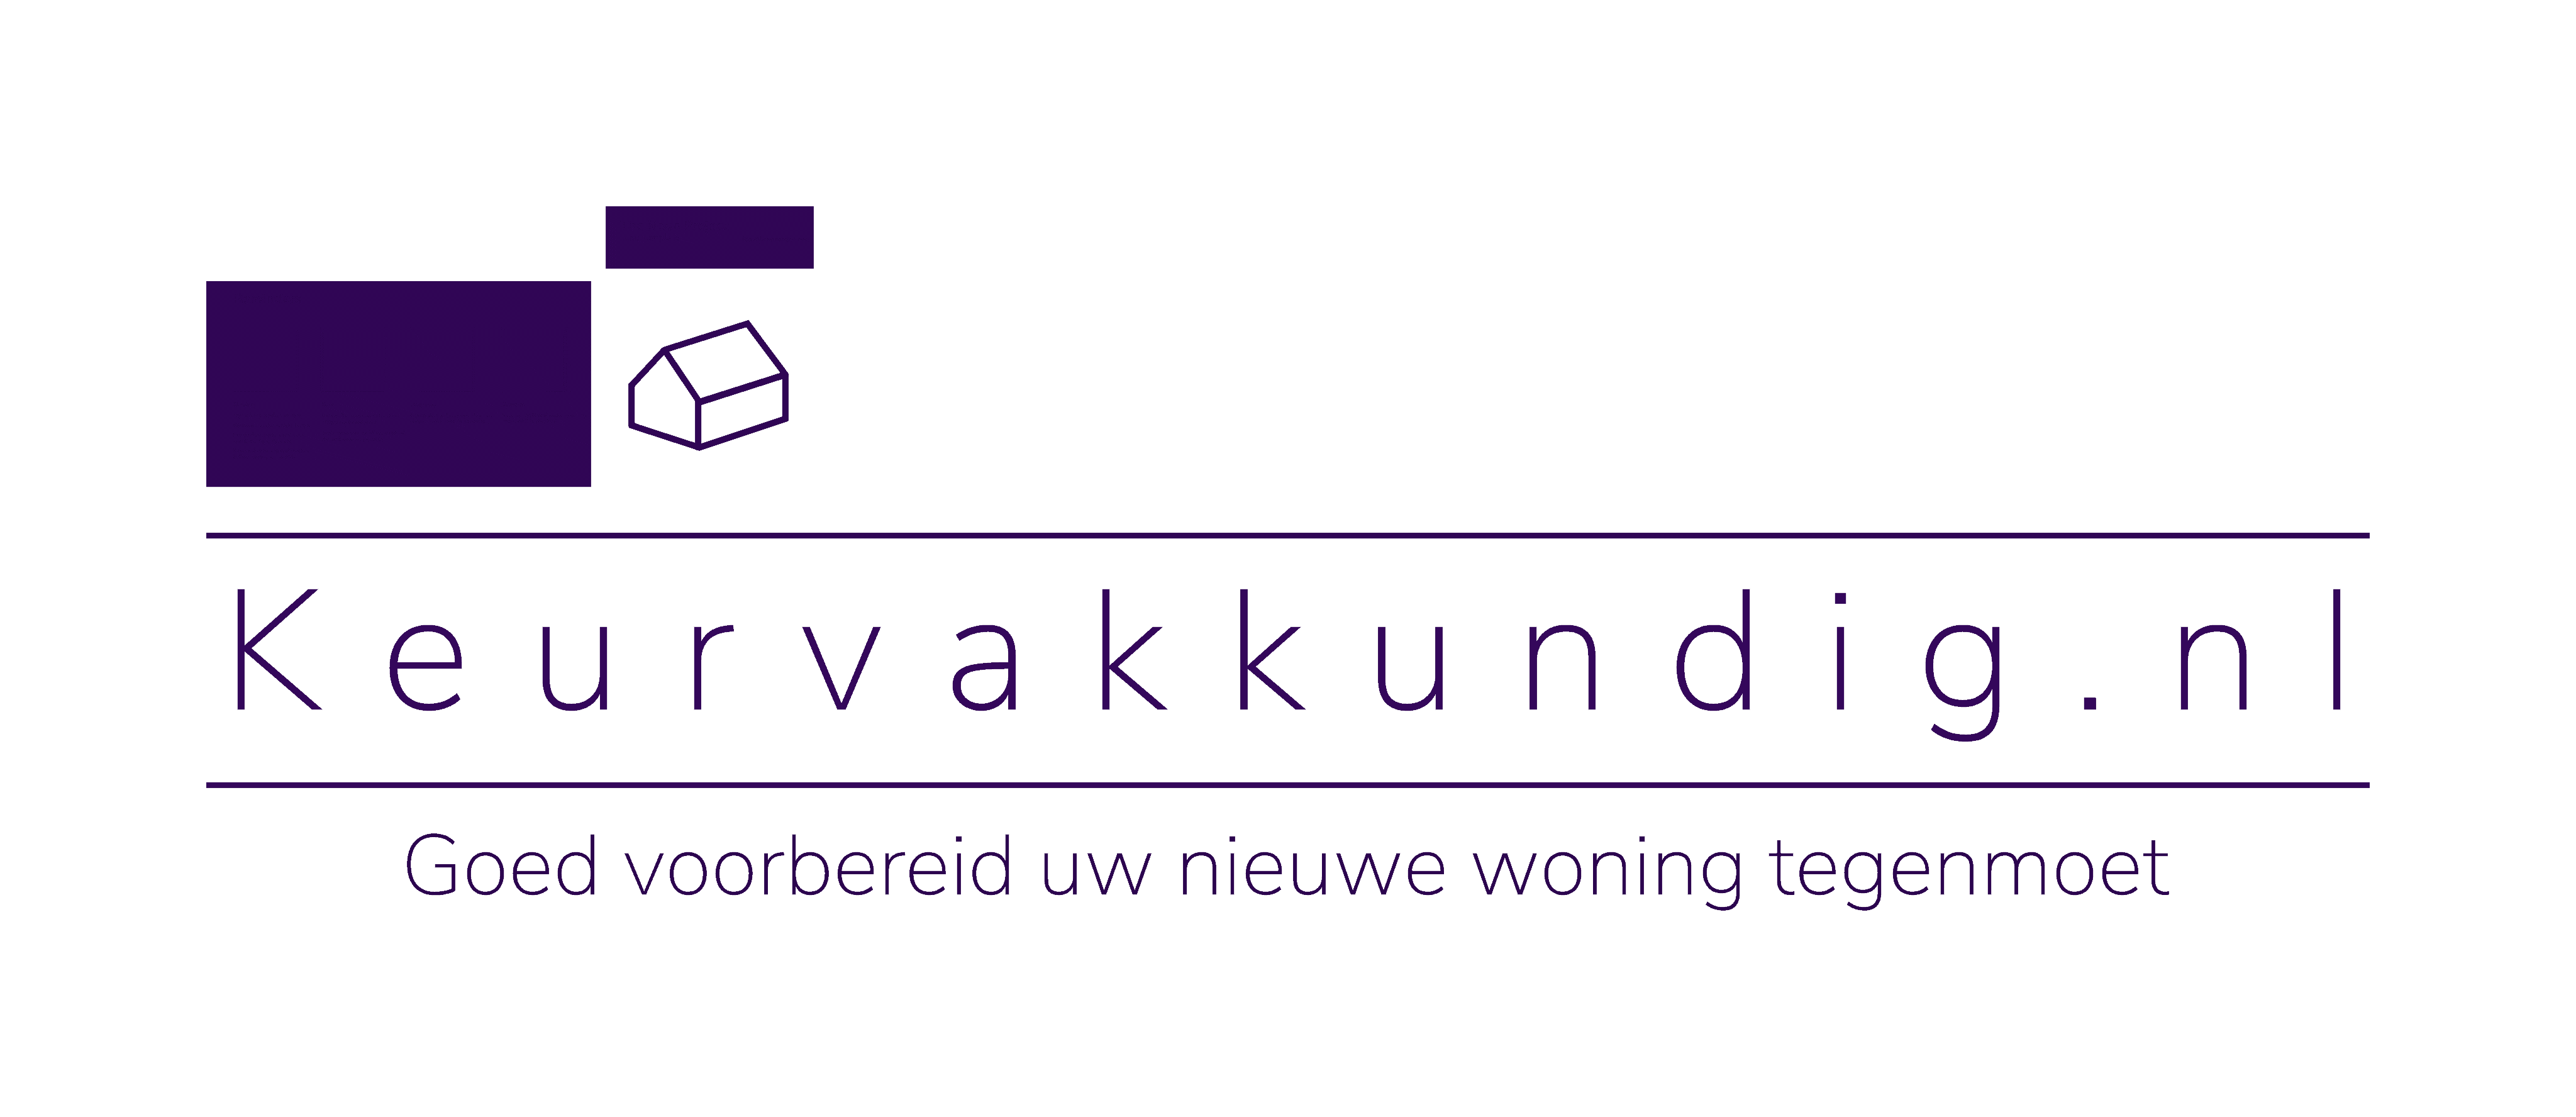 https://www.virtualstars.nl/wp-content/uploads/2020/07/Transparant-1.png